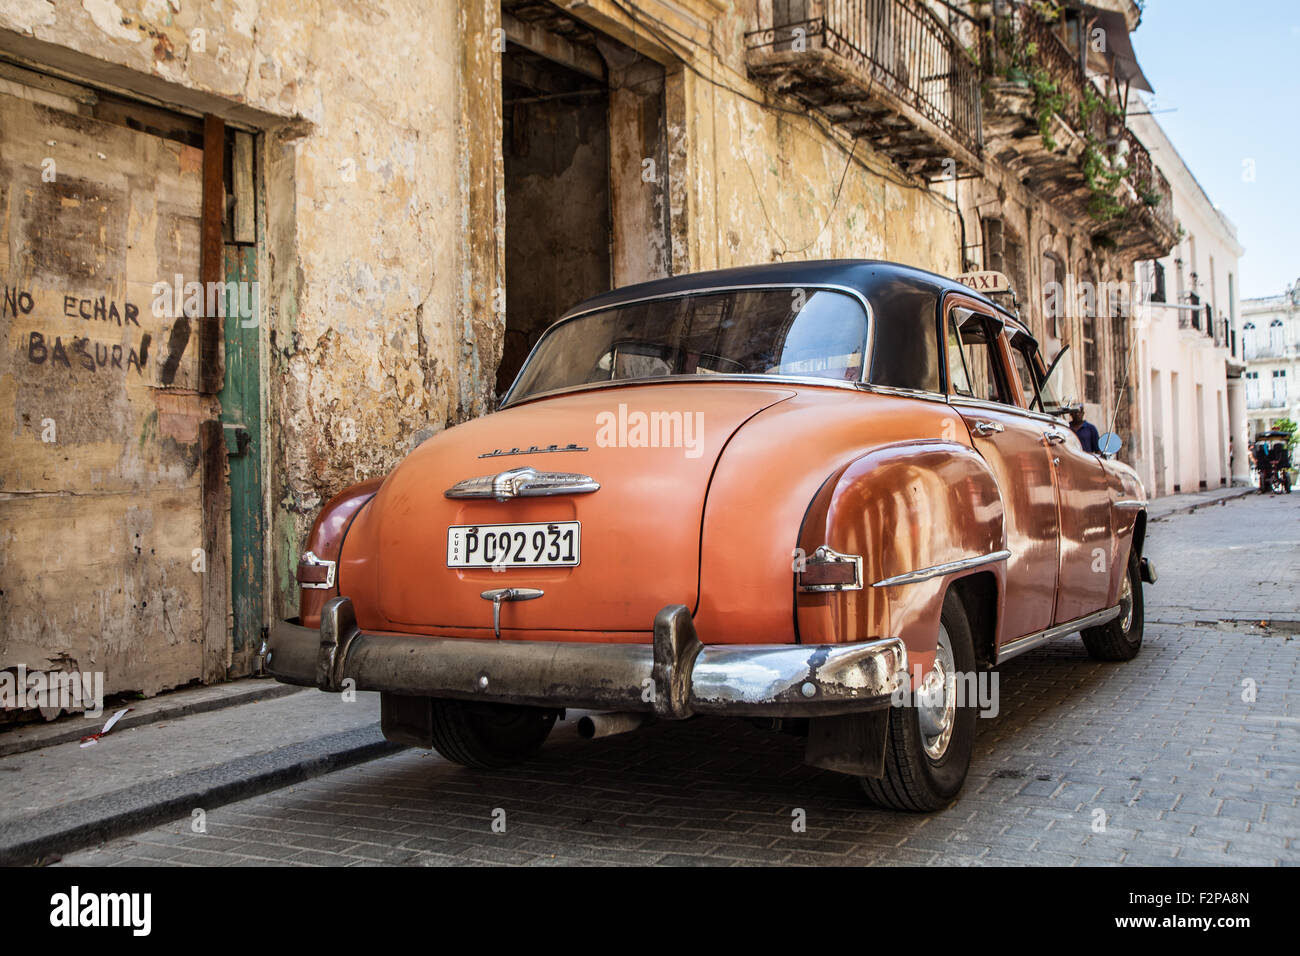 Coches de la Habana Imagen De Stock